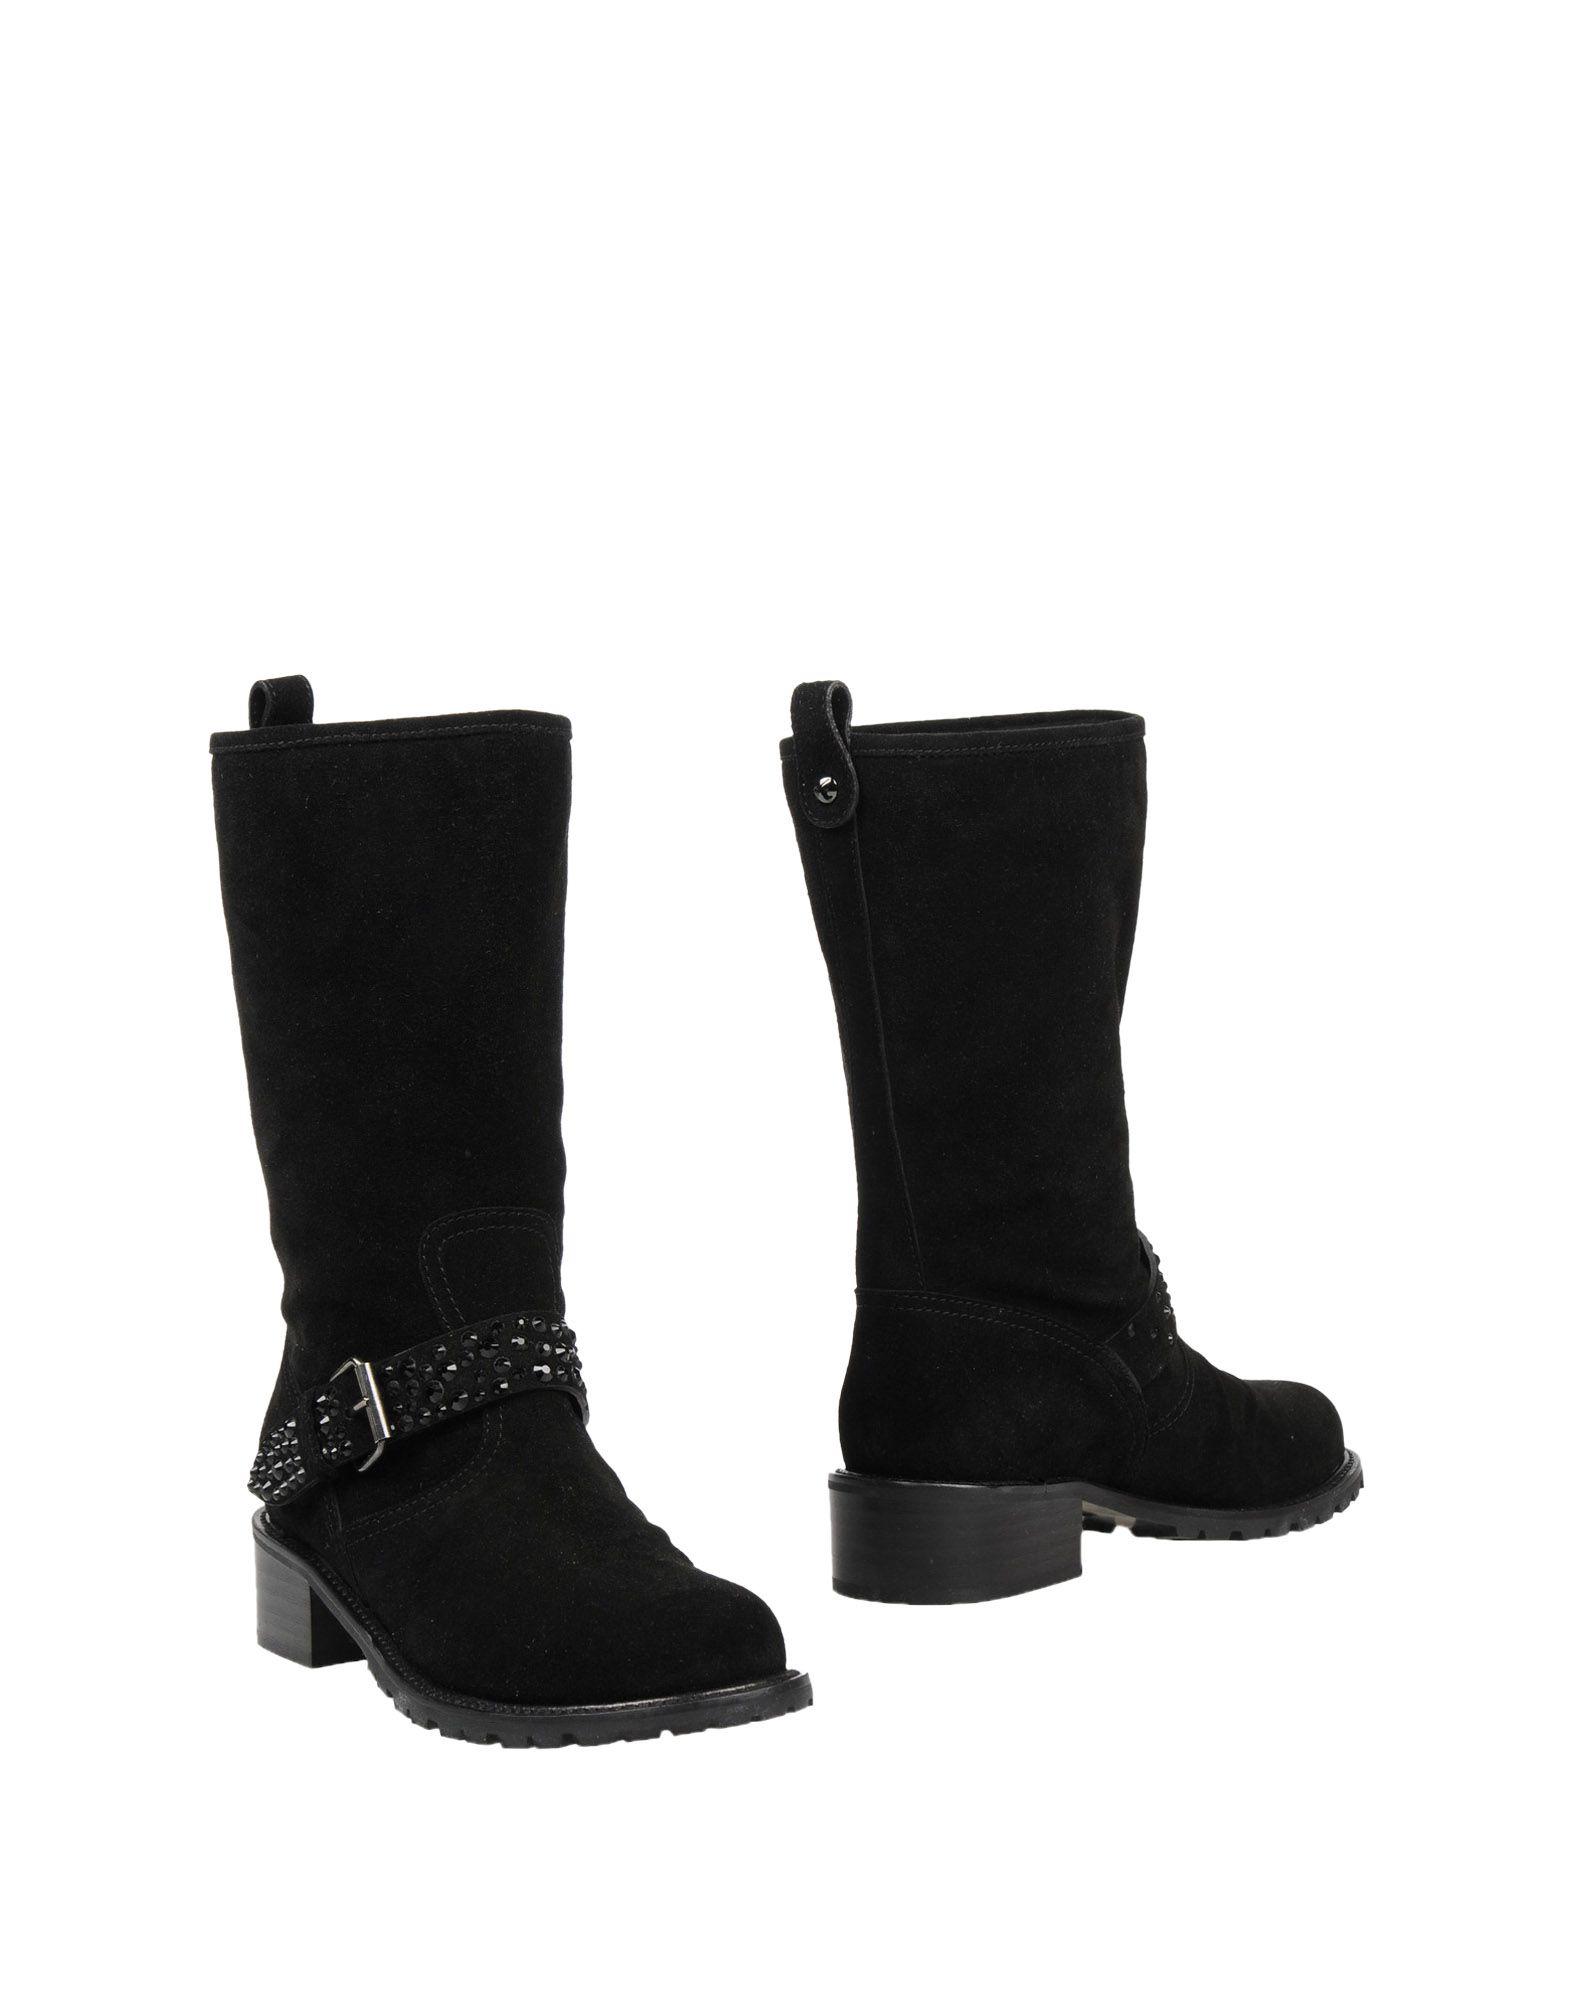 Giuseppe Zanotti Stiefelette Damen Damen Stiefelette  11415765XA Neue Schuhe cde9e3